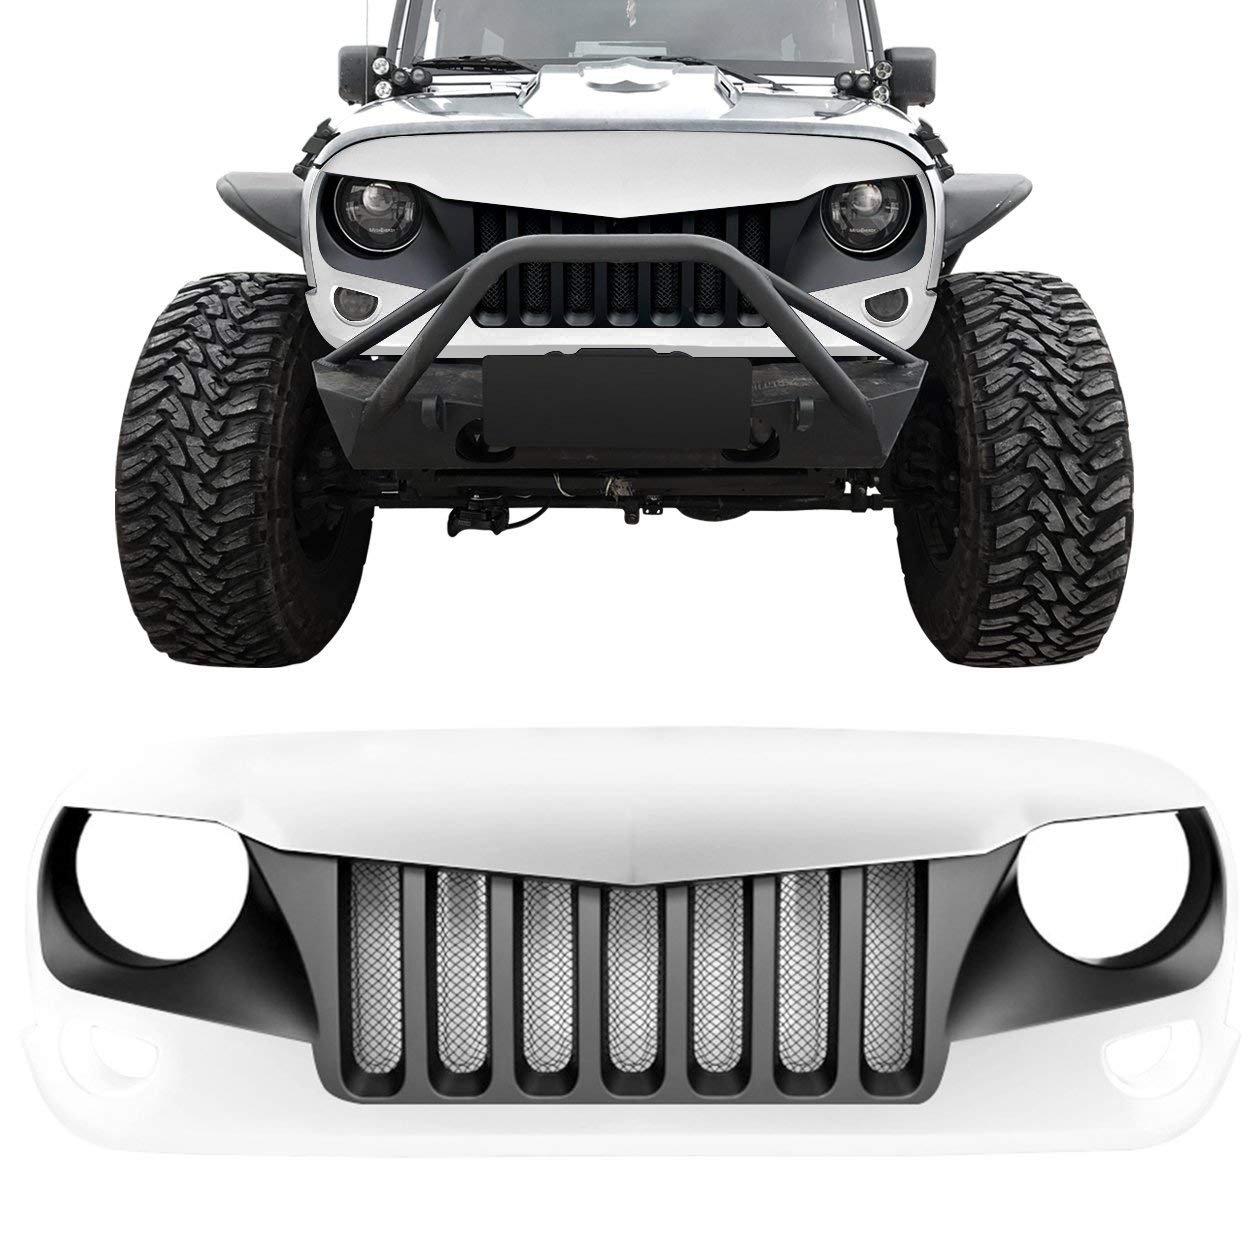 IPARTS Front Grille for Jeep Wrangler 2007-2017 Rubicon Sahara Sport JK JKU (Black white)